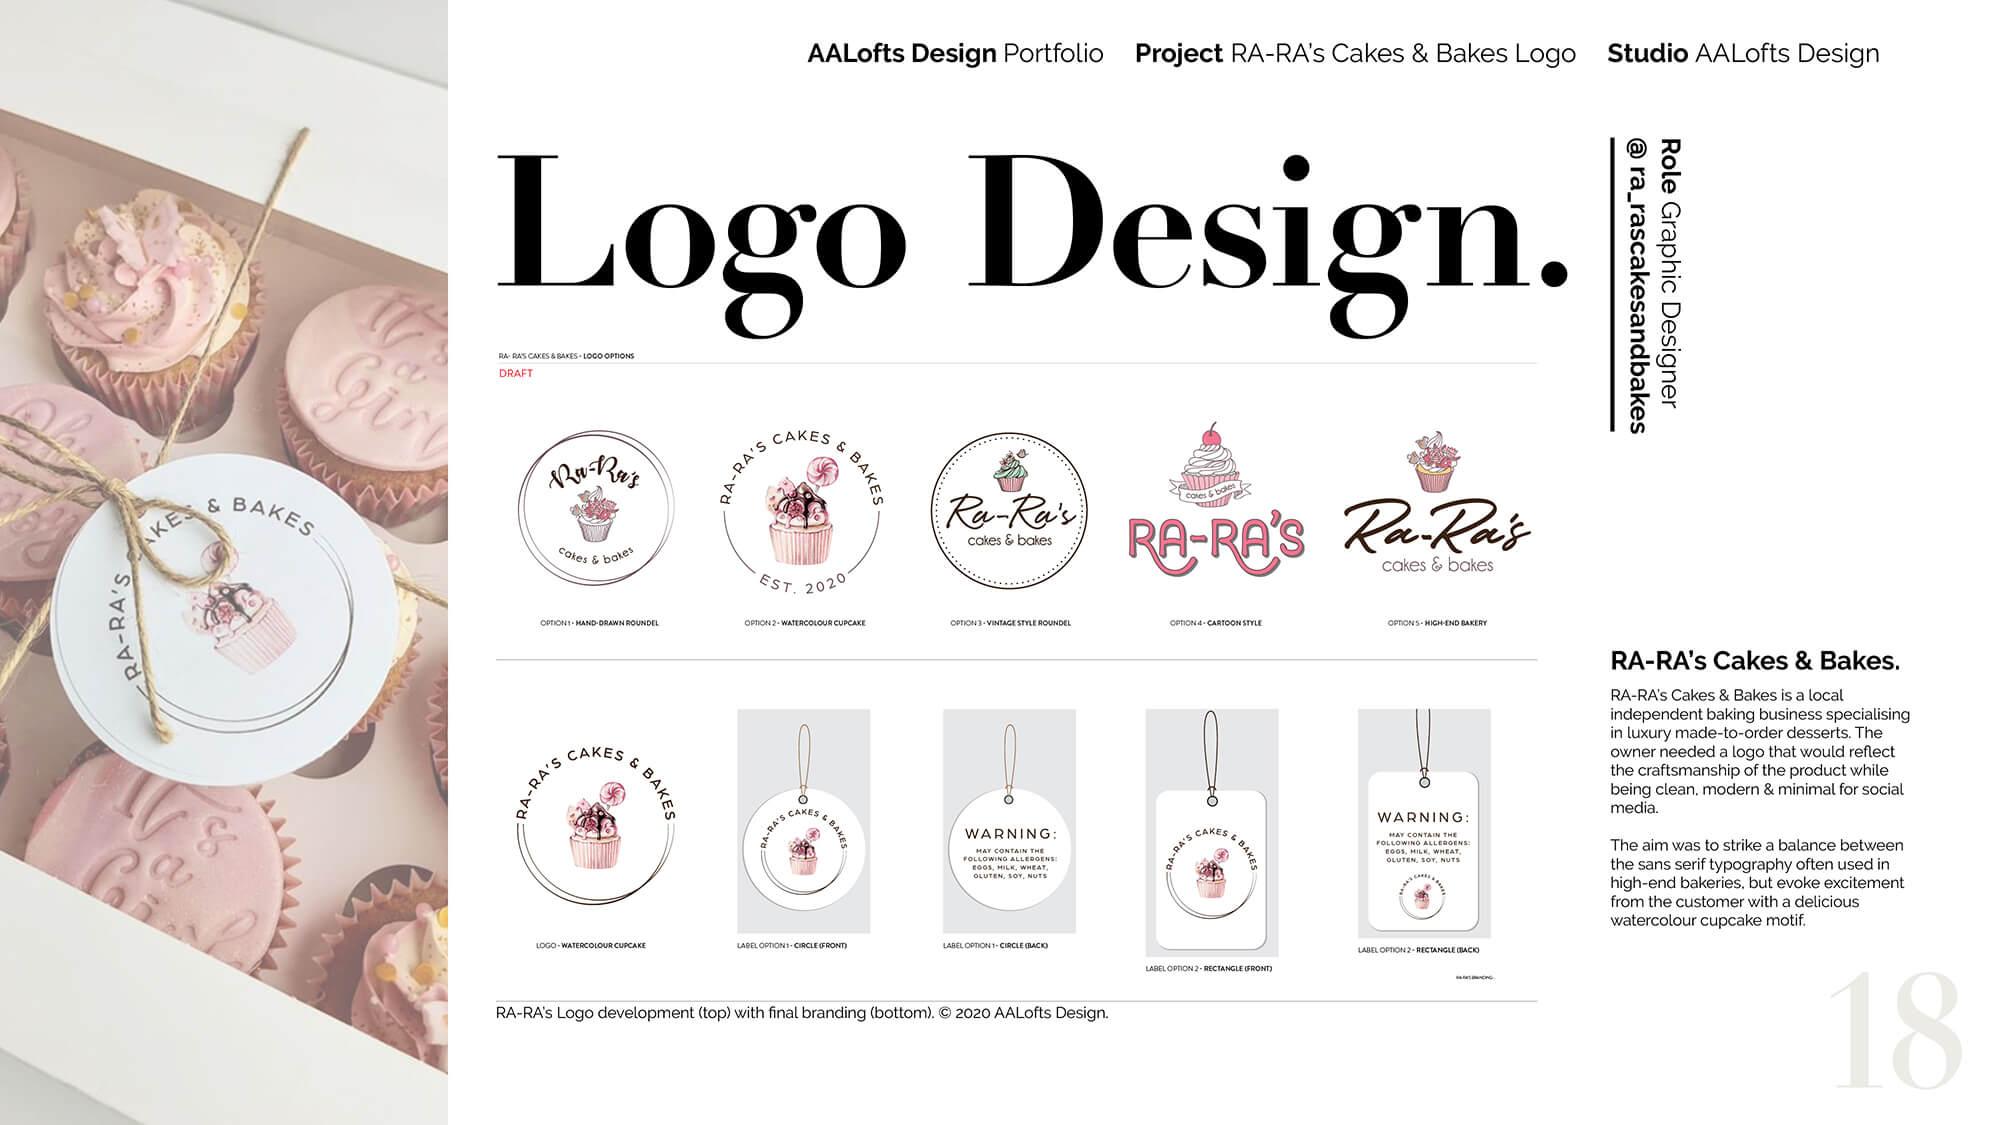 2021_AALOFTS DESIGN PORTFOLIO_Page_18